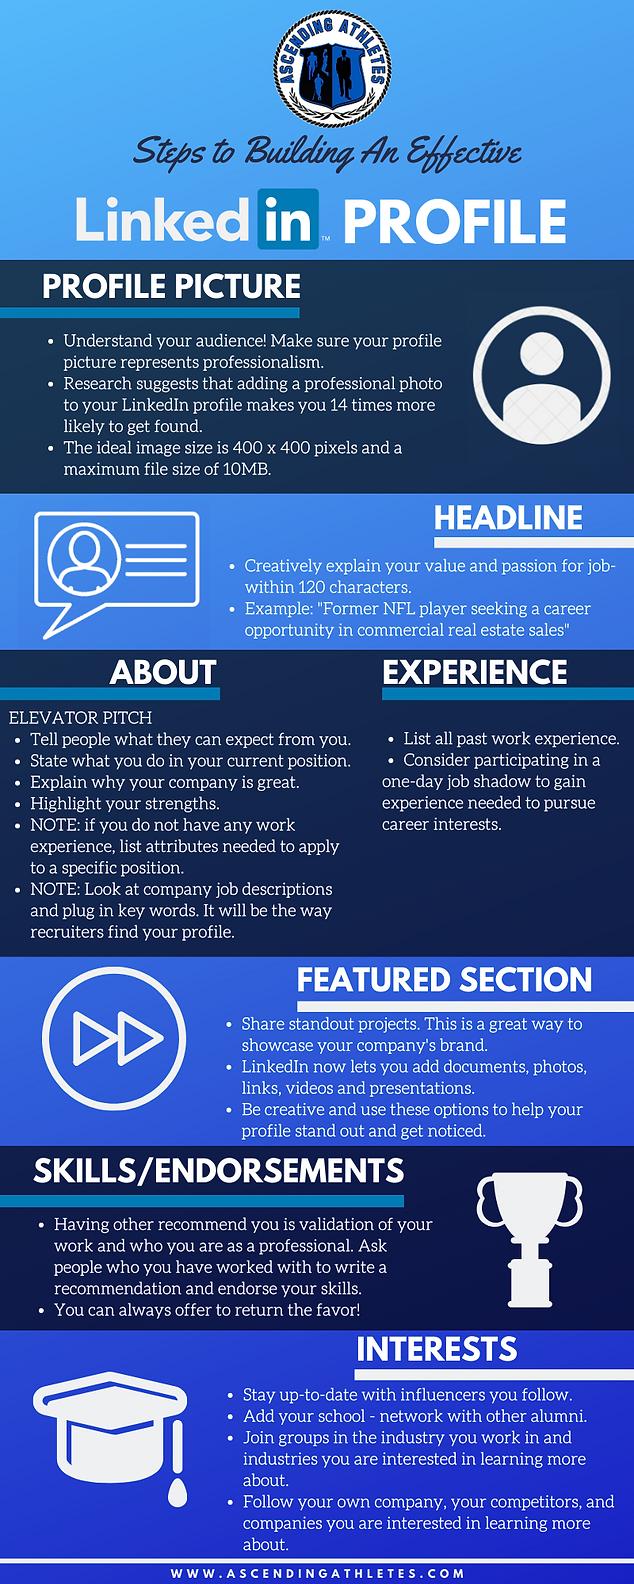 Building An Effective LinkedIn Profile (